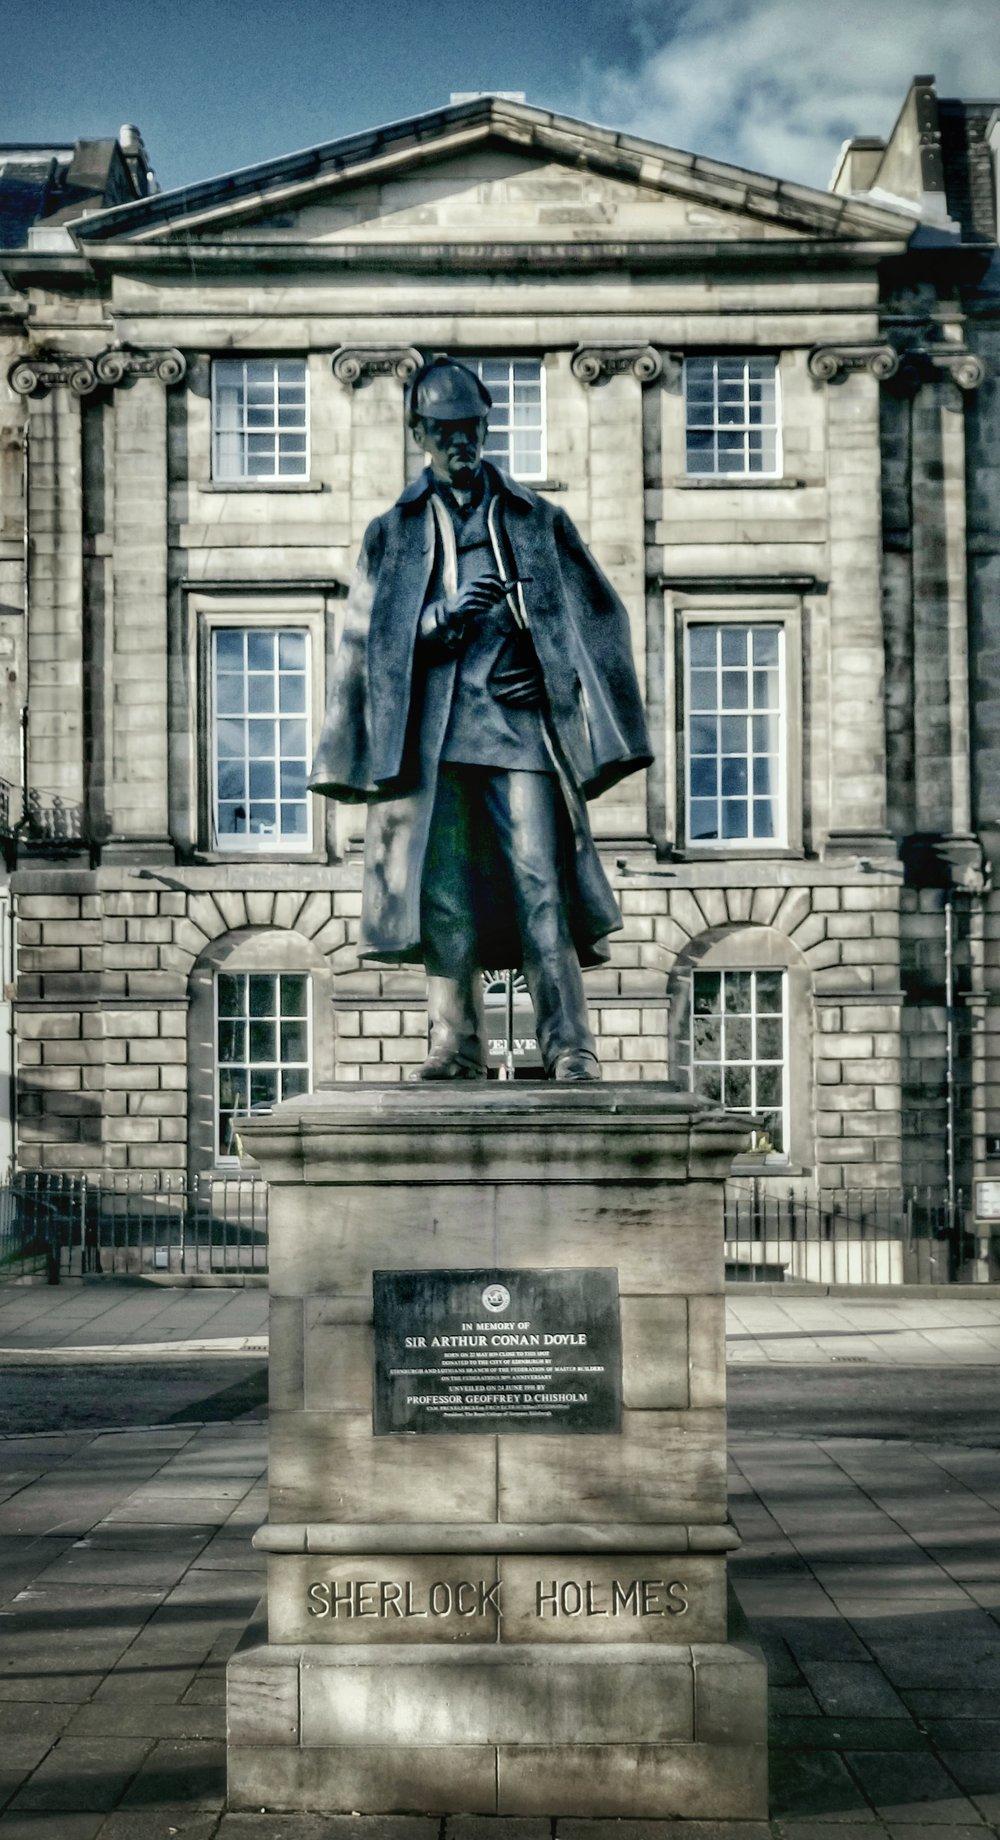 Sherlock Holmes-Sir Arthur Conan Doyle